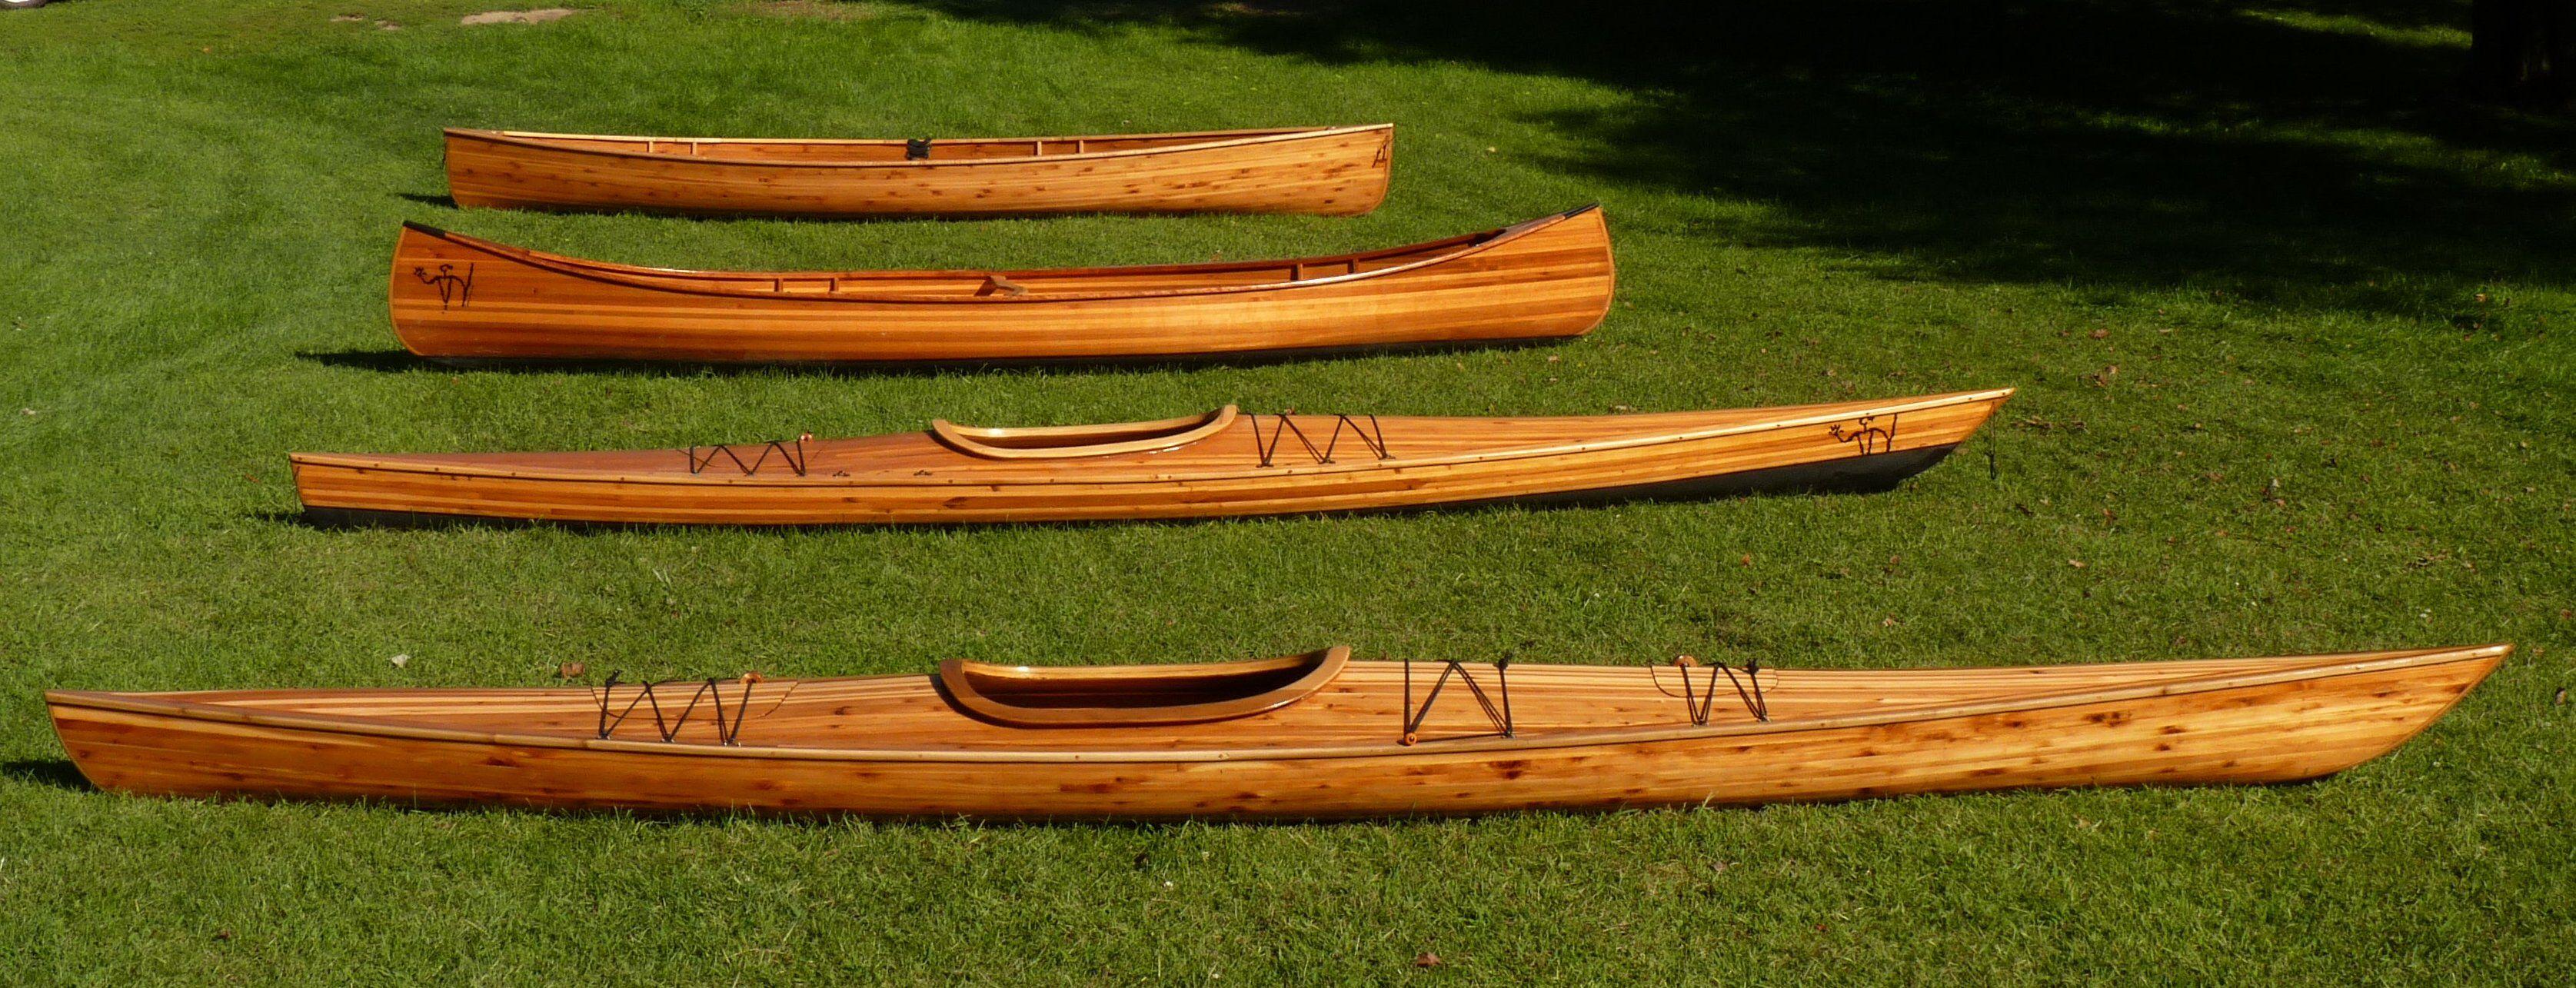 building-canoe-canoe-eight-plan-strip